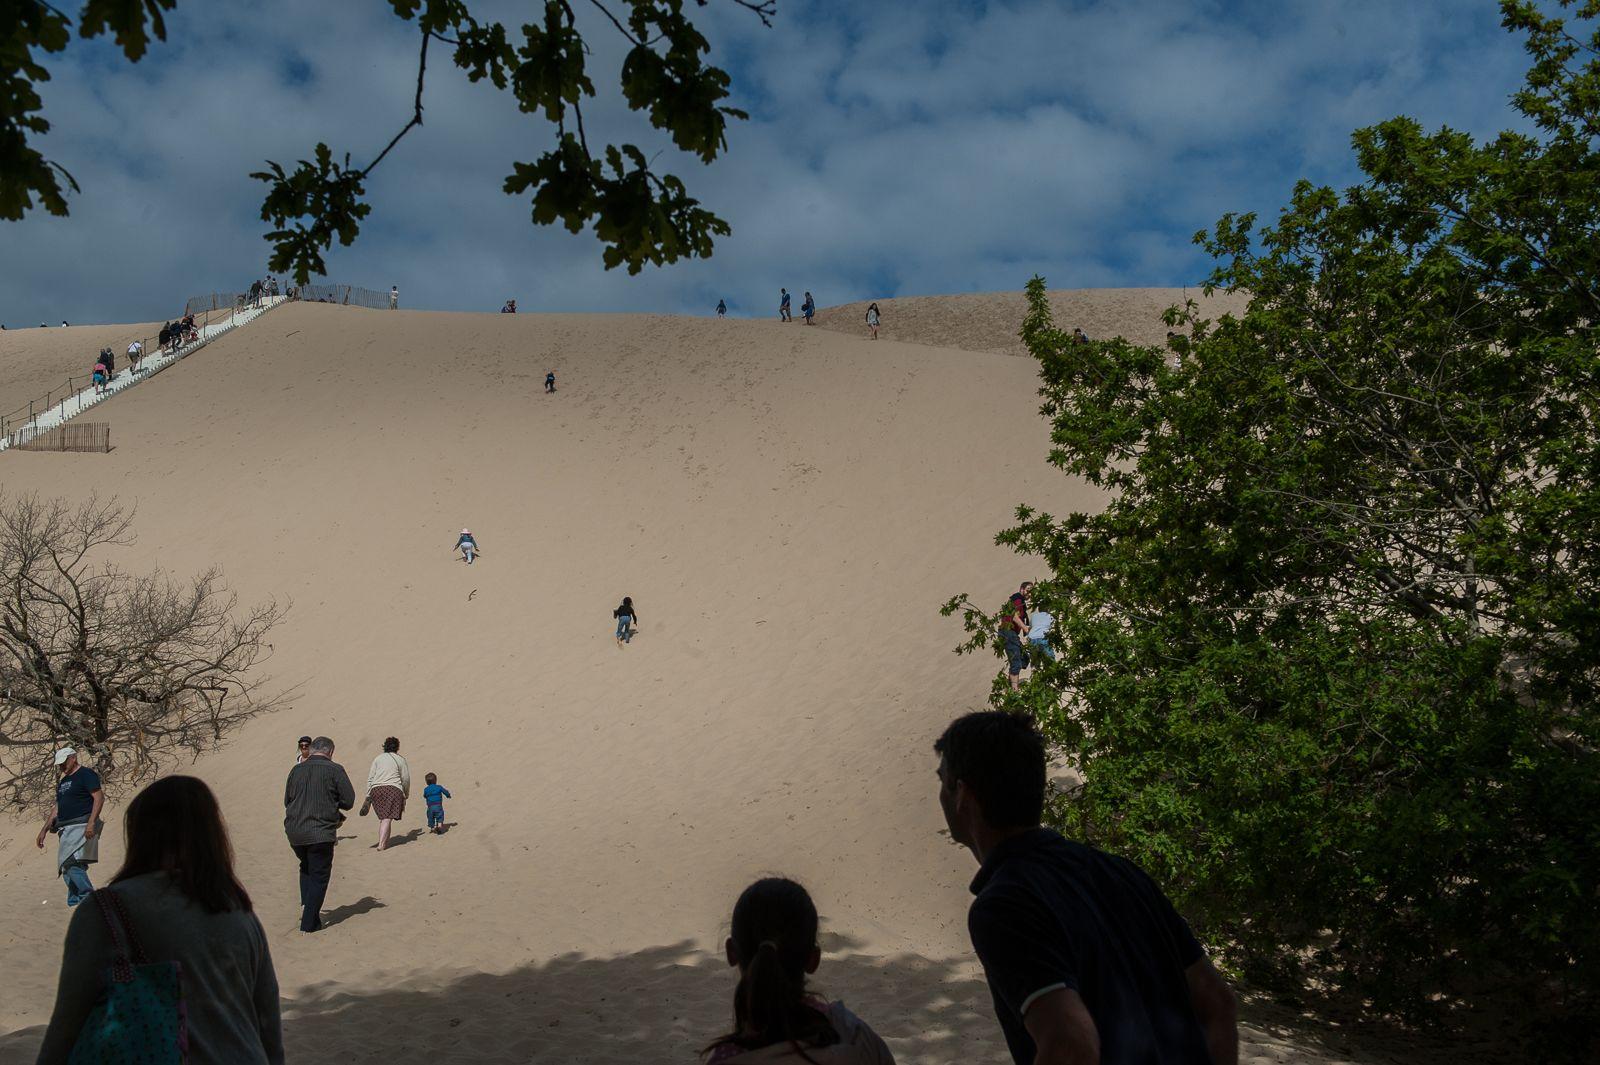 arcachon cap ferret bordeaux dune du pilat utazás